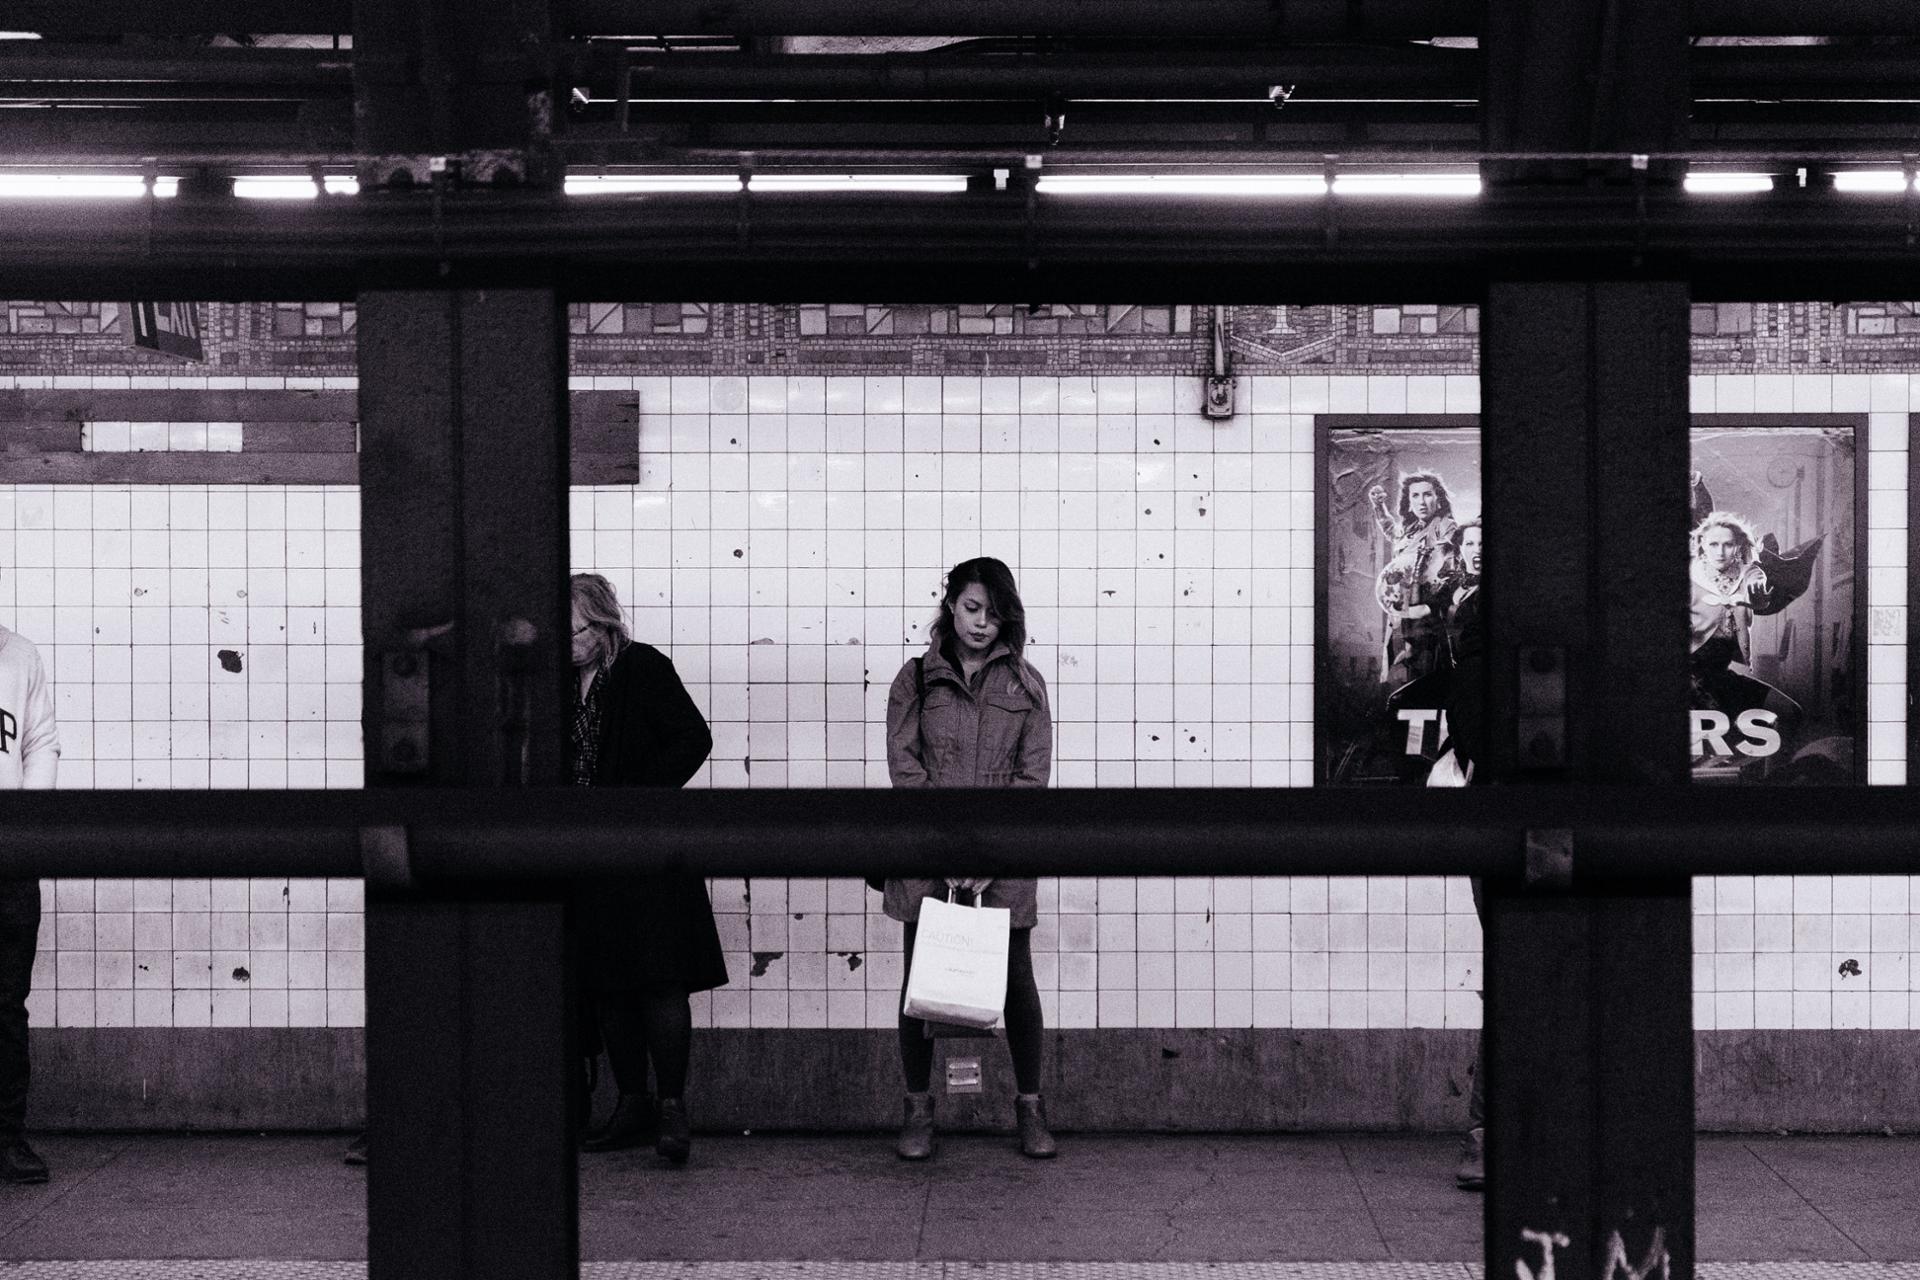 New York daily commute